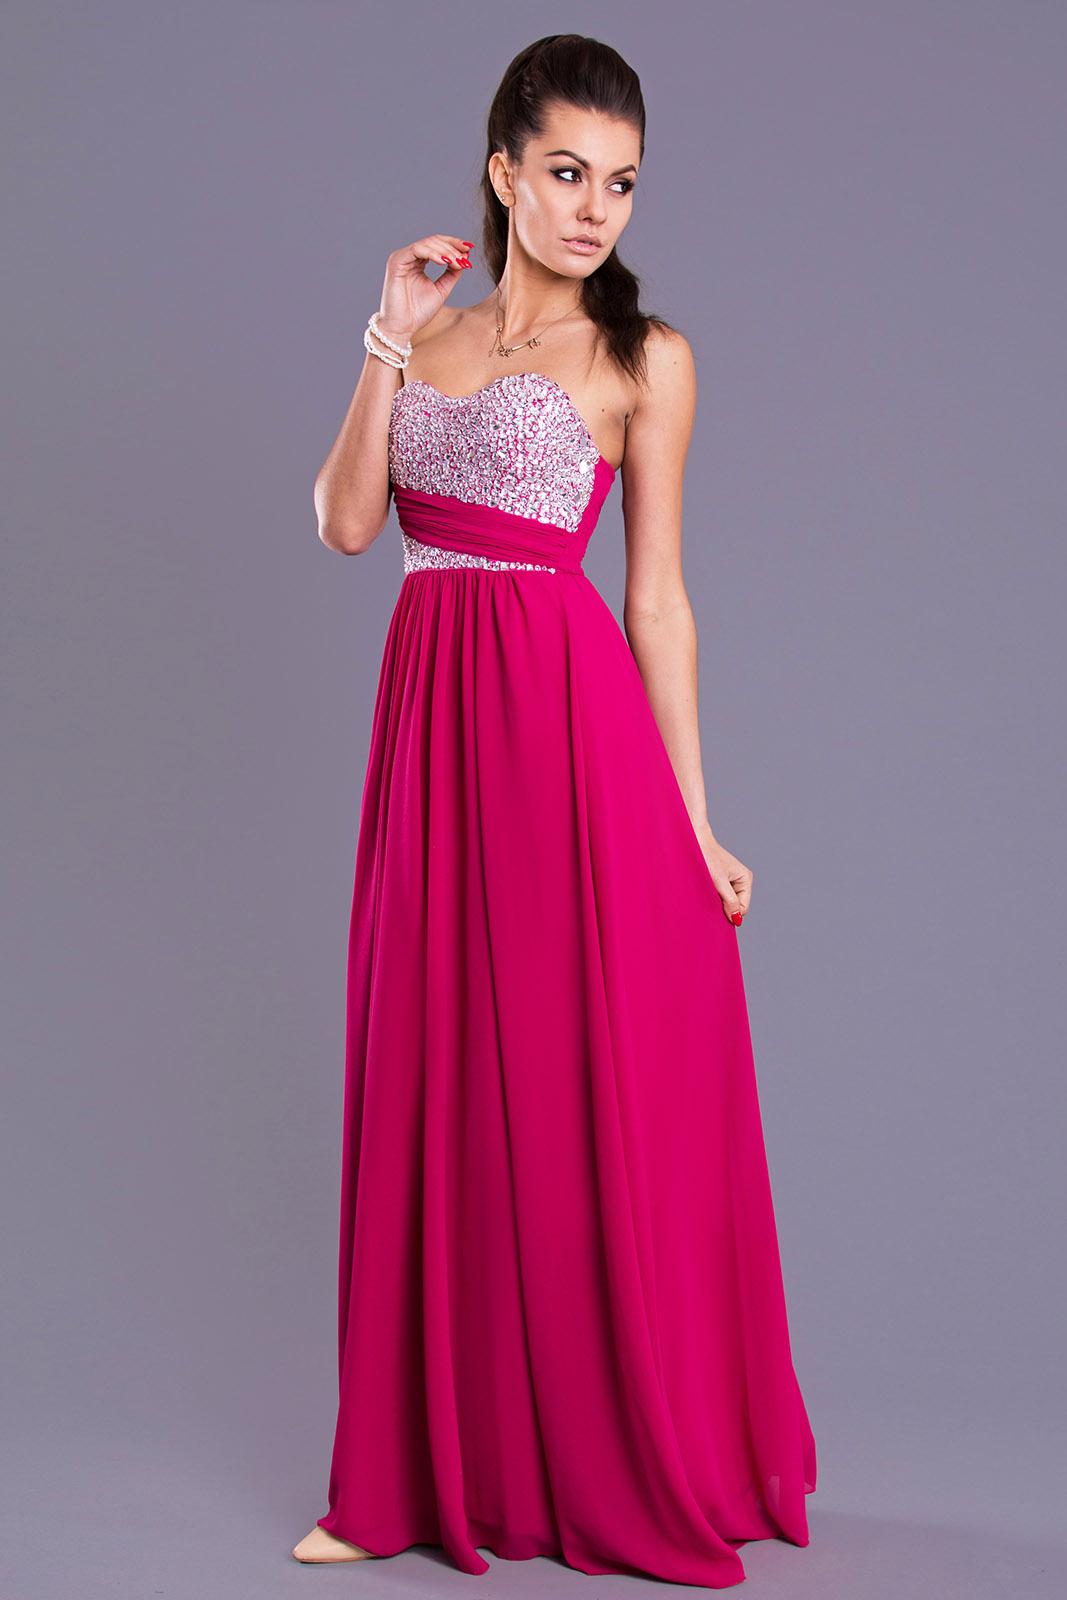 EVA & LOLA DRESS - FUCHSIA 7816-3